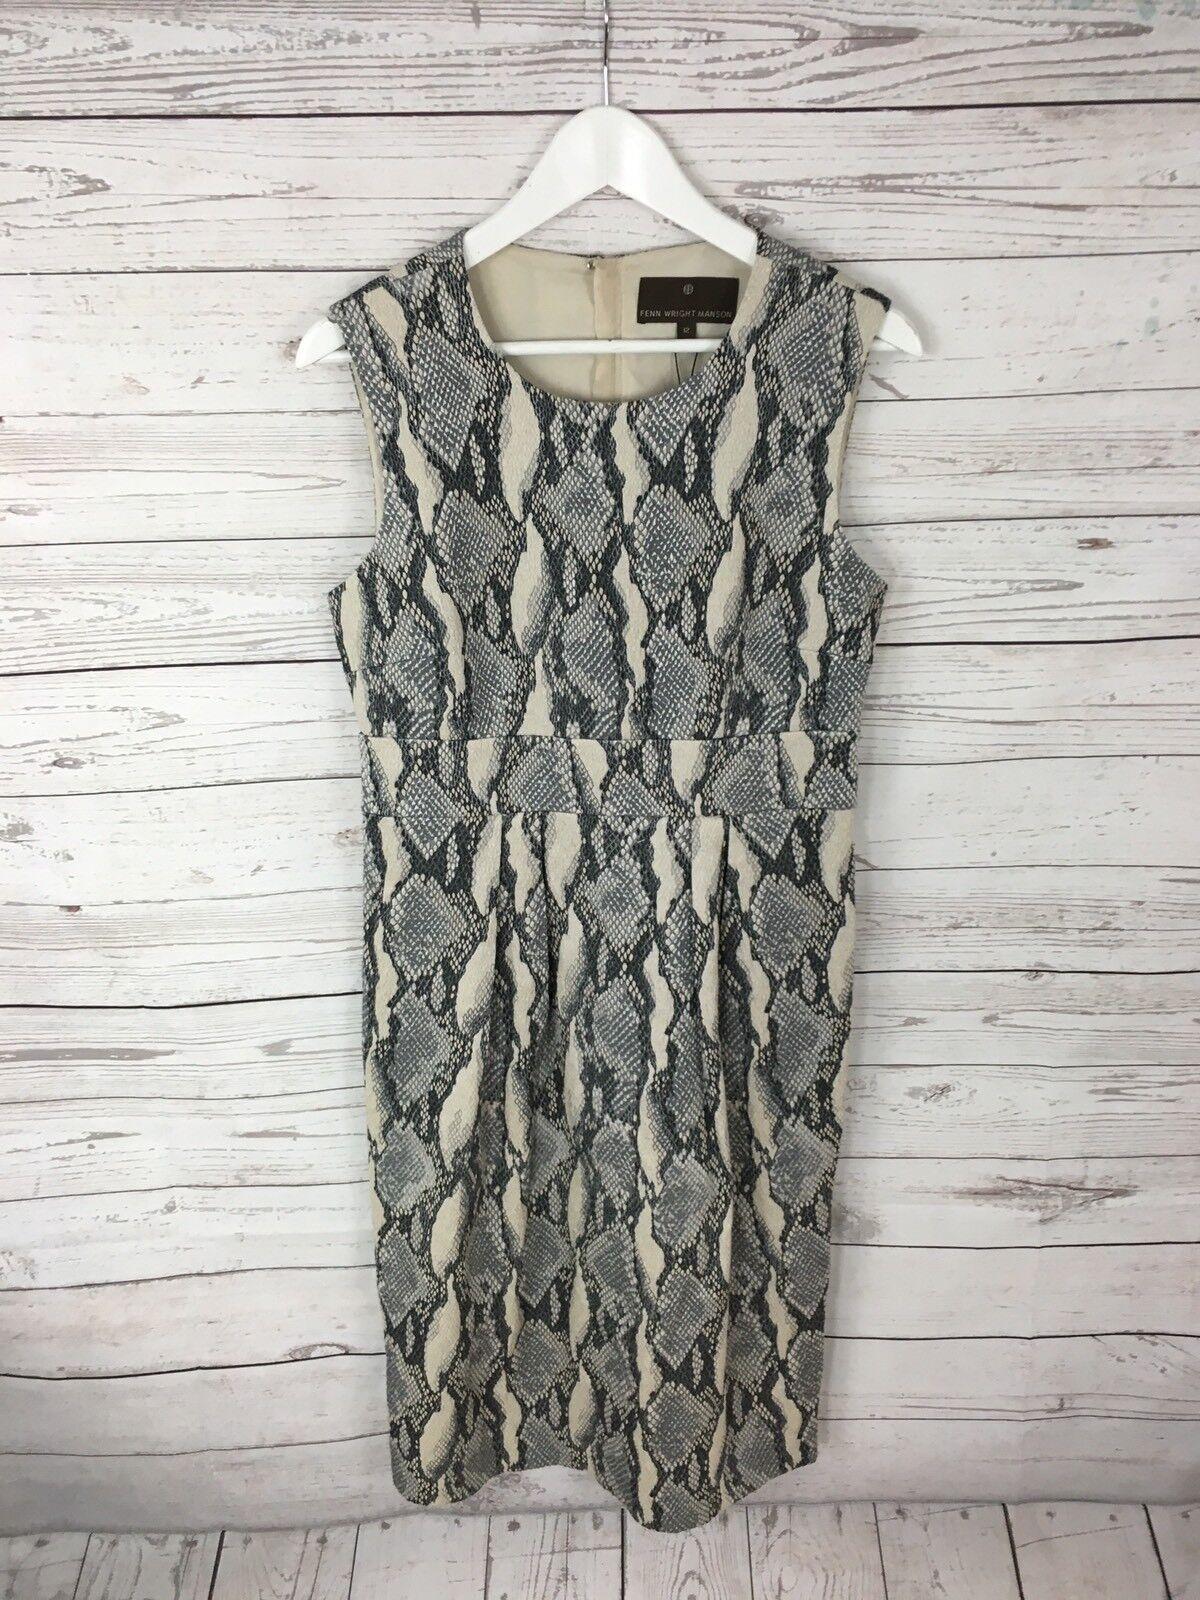 FENN WRIGHT MANSON Dress - Size UK12 - Snakeskin - Great Condition